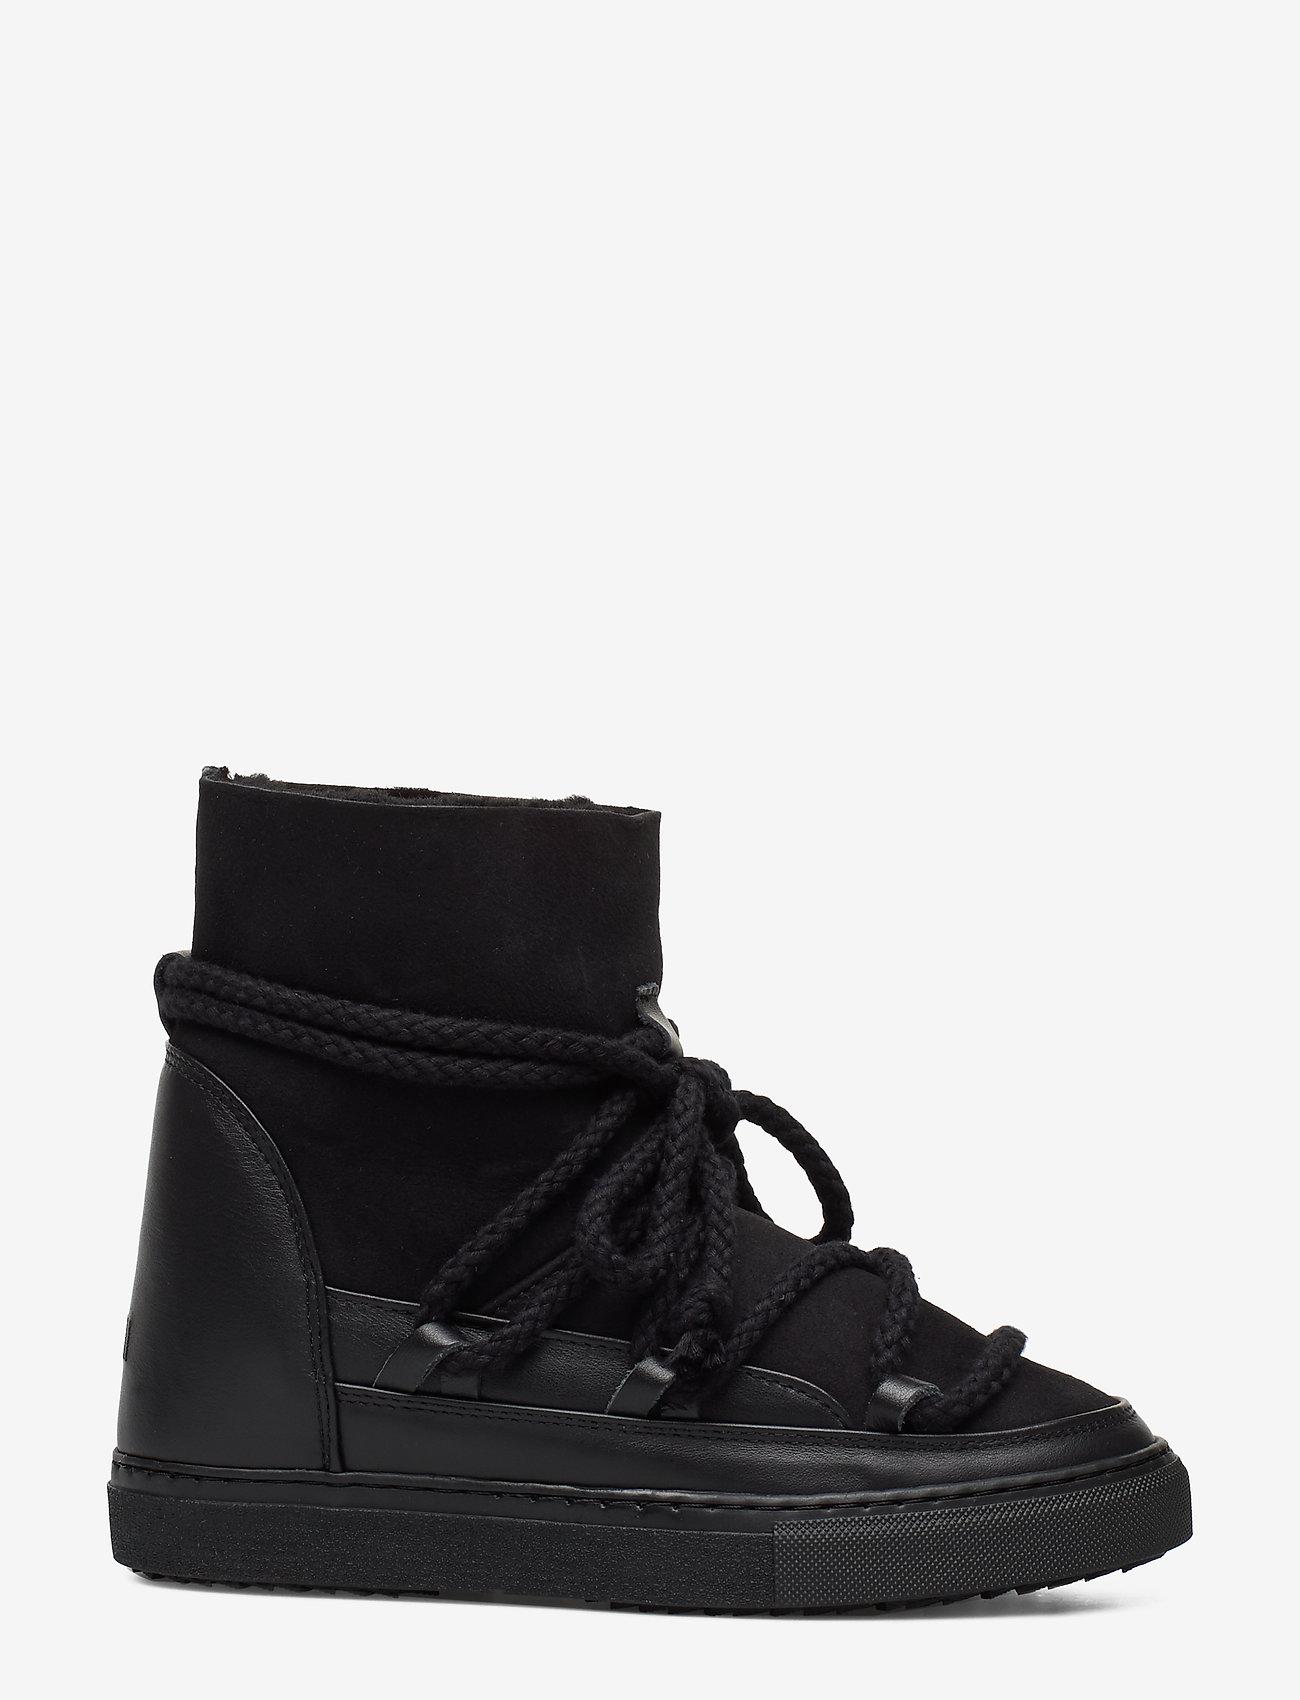 Inuikii - Women Sneaker Classic WEDGE - flat ankle boots - black - 0